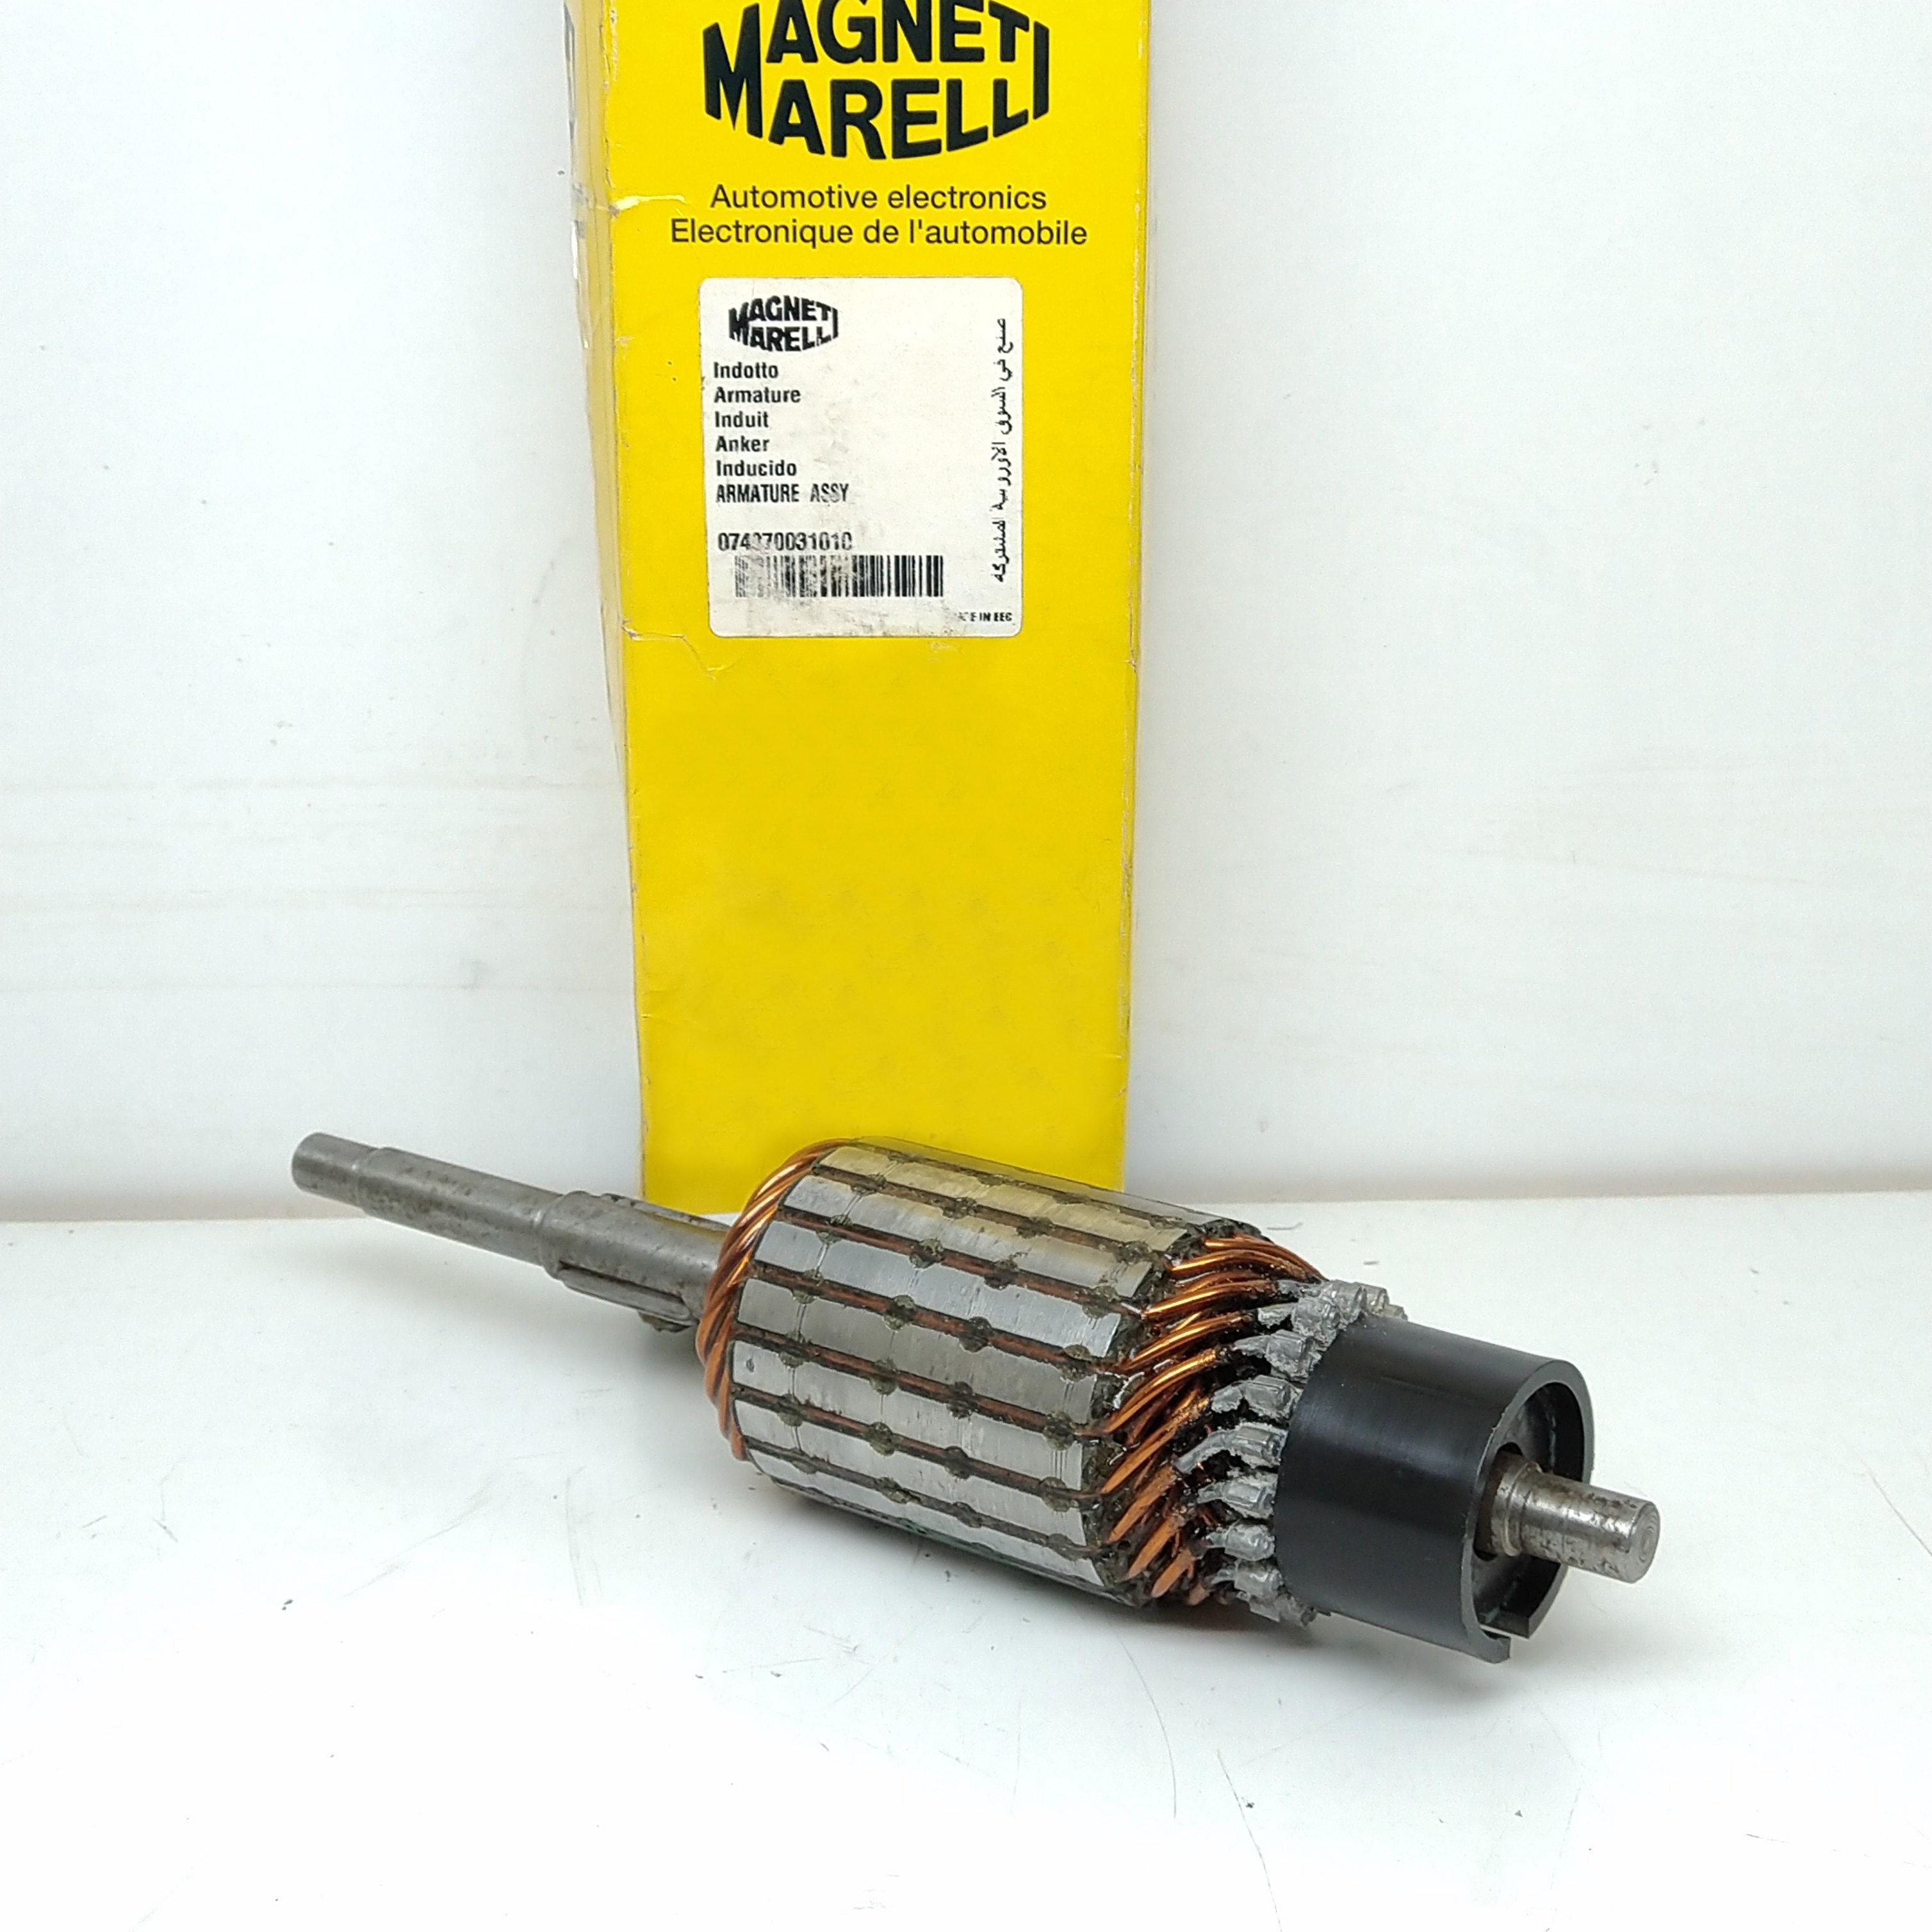 Rotor pour Alternateur Marelli Fiat 500 126